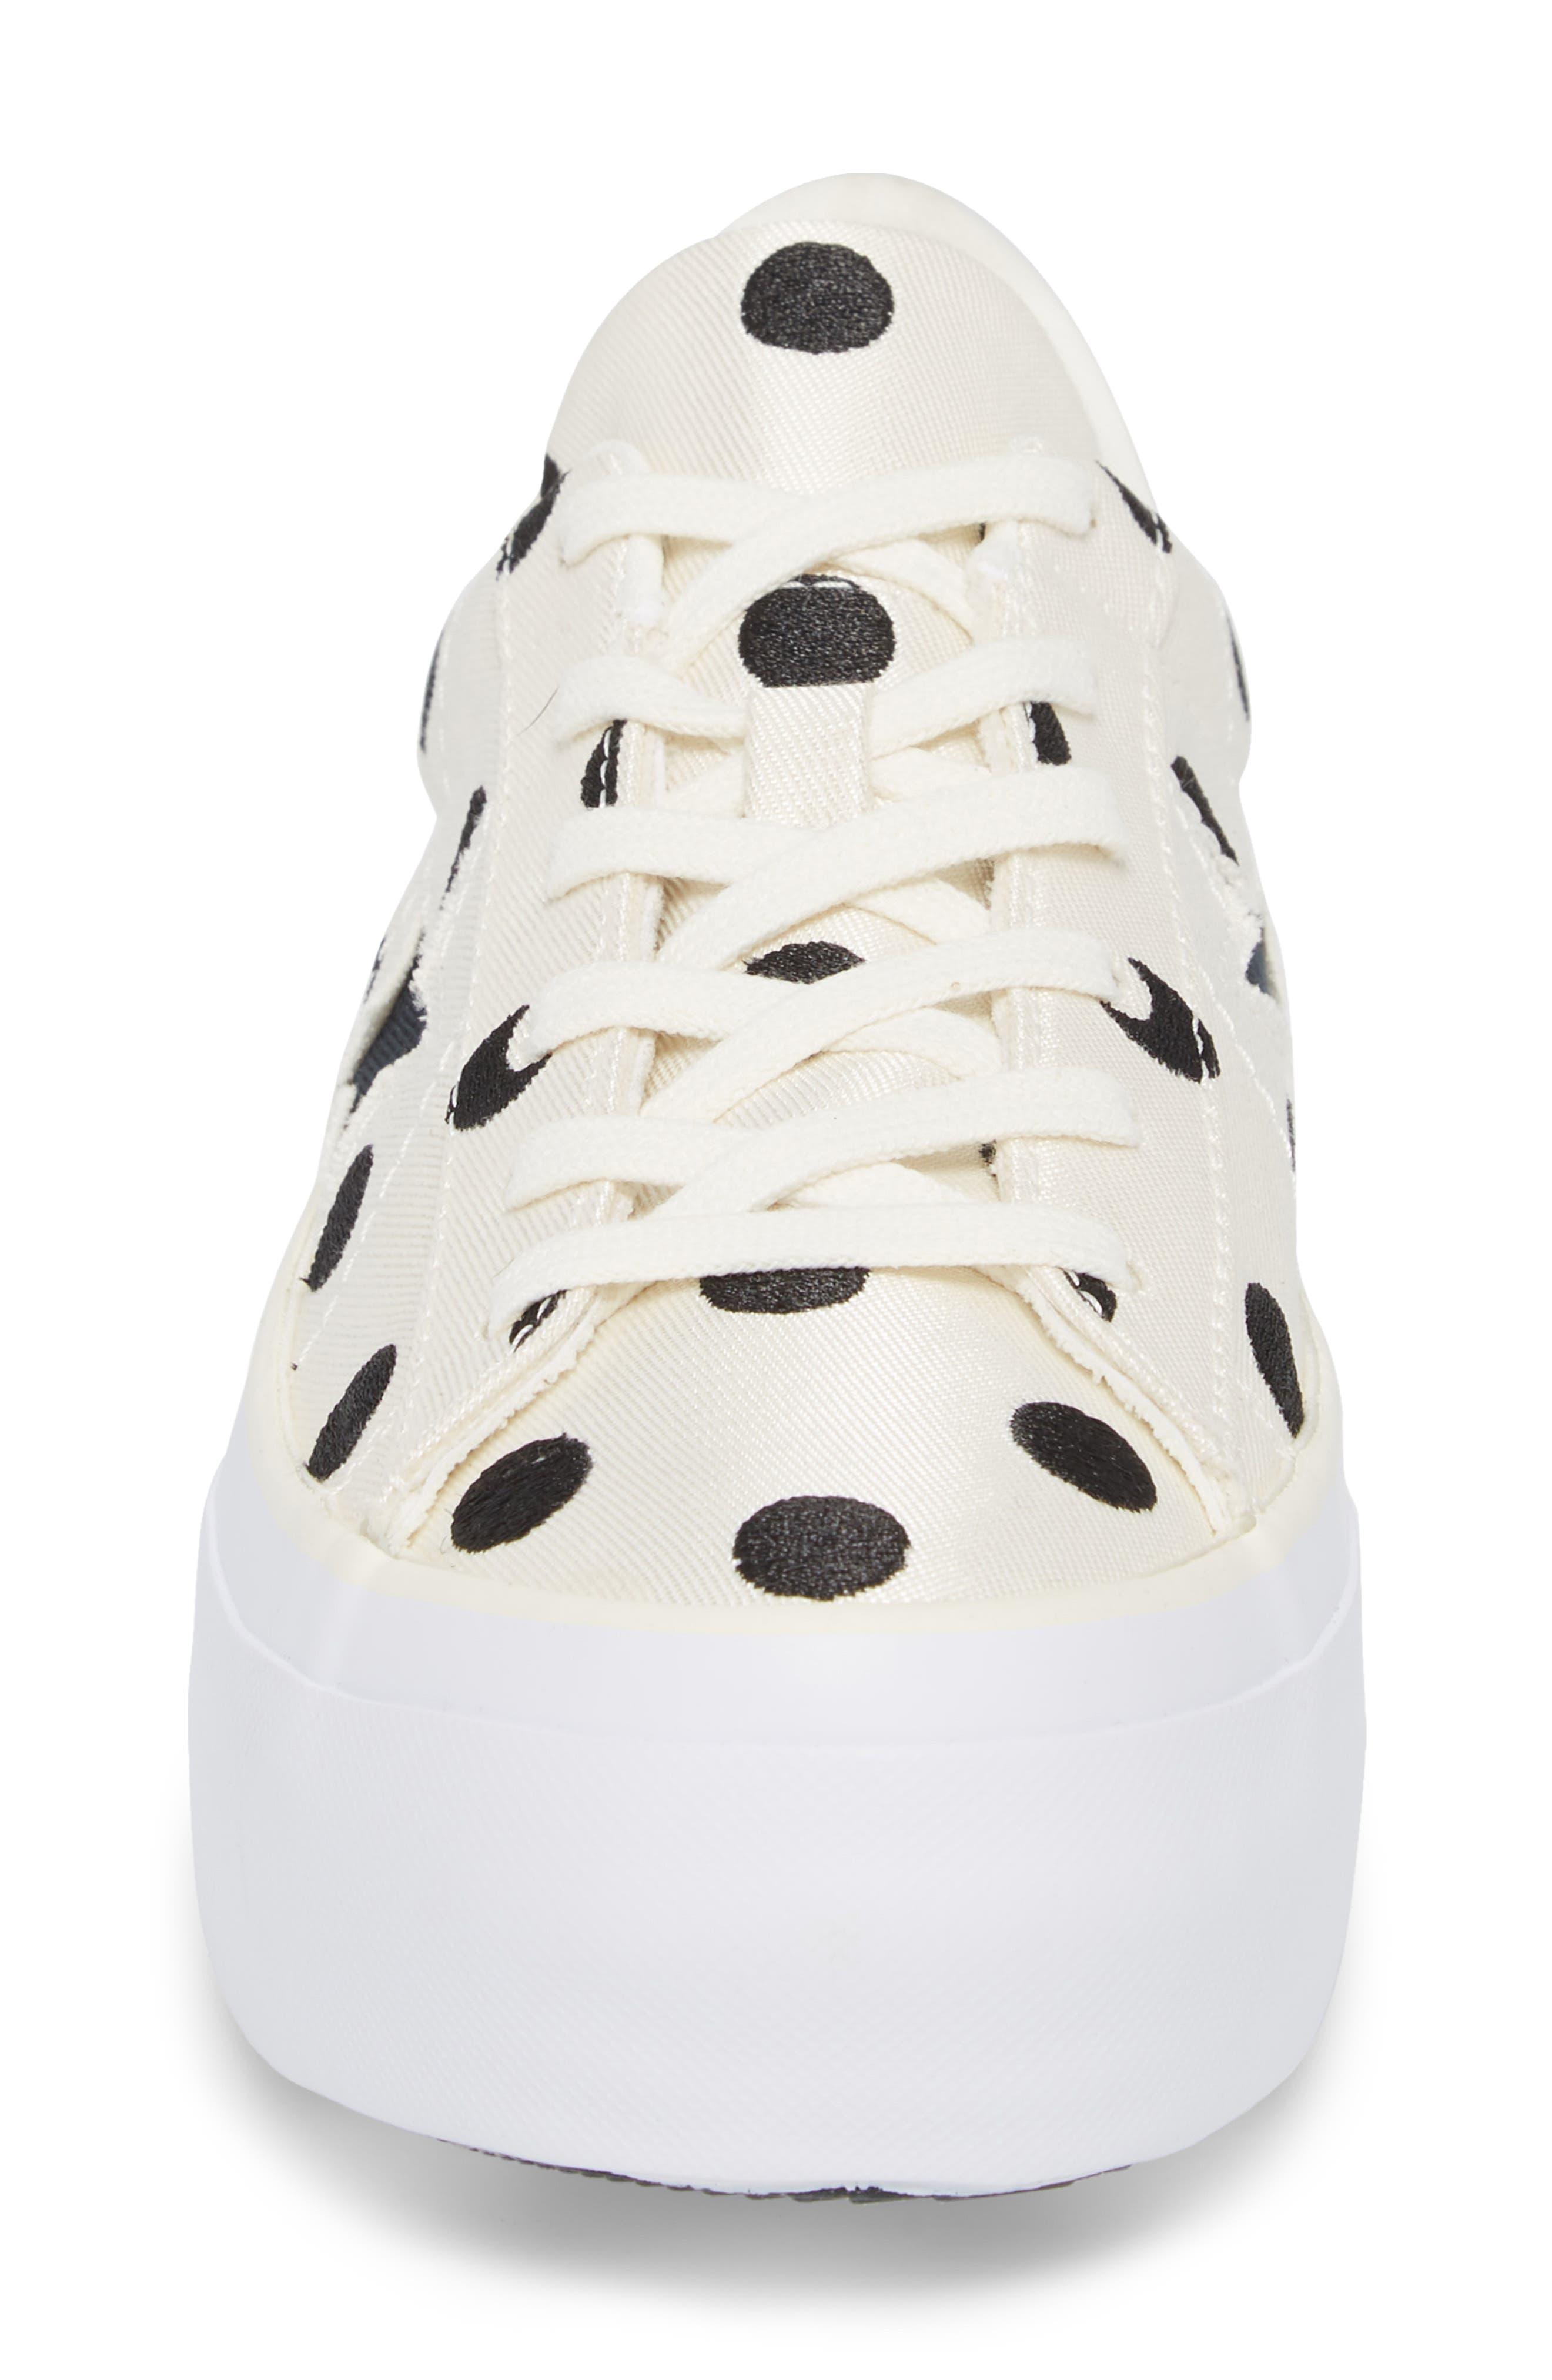 Chuck Taylor<sup>®</sup> One Star Platform Sneaker,                             Alternate thumbnail 4, color,                             Egret/ Black